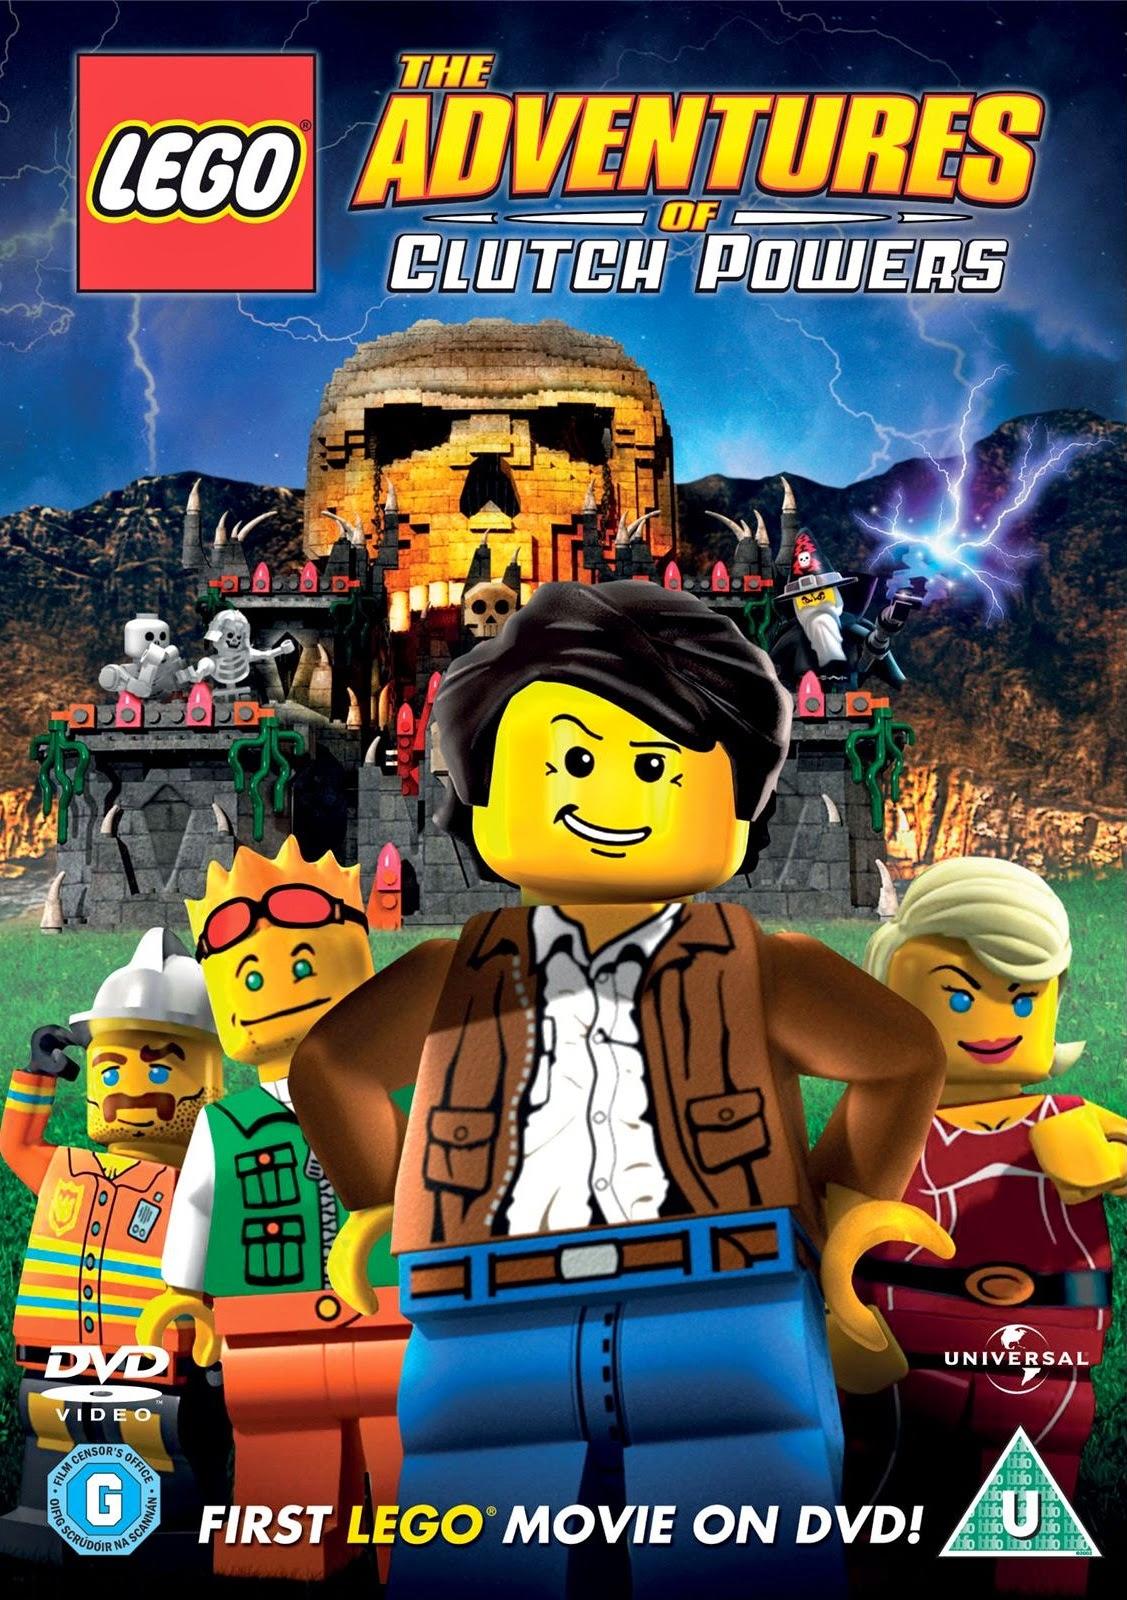 LEGO: THE ADVENTURES OF CLUTCH POWERS ยอดทีมฮีโร่อัจฉริยะ HD [1080p]